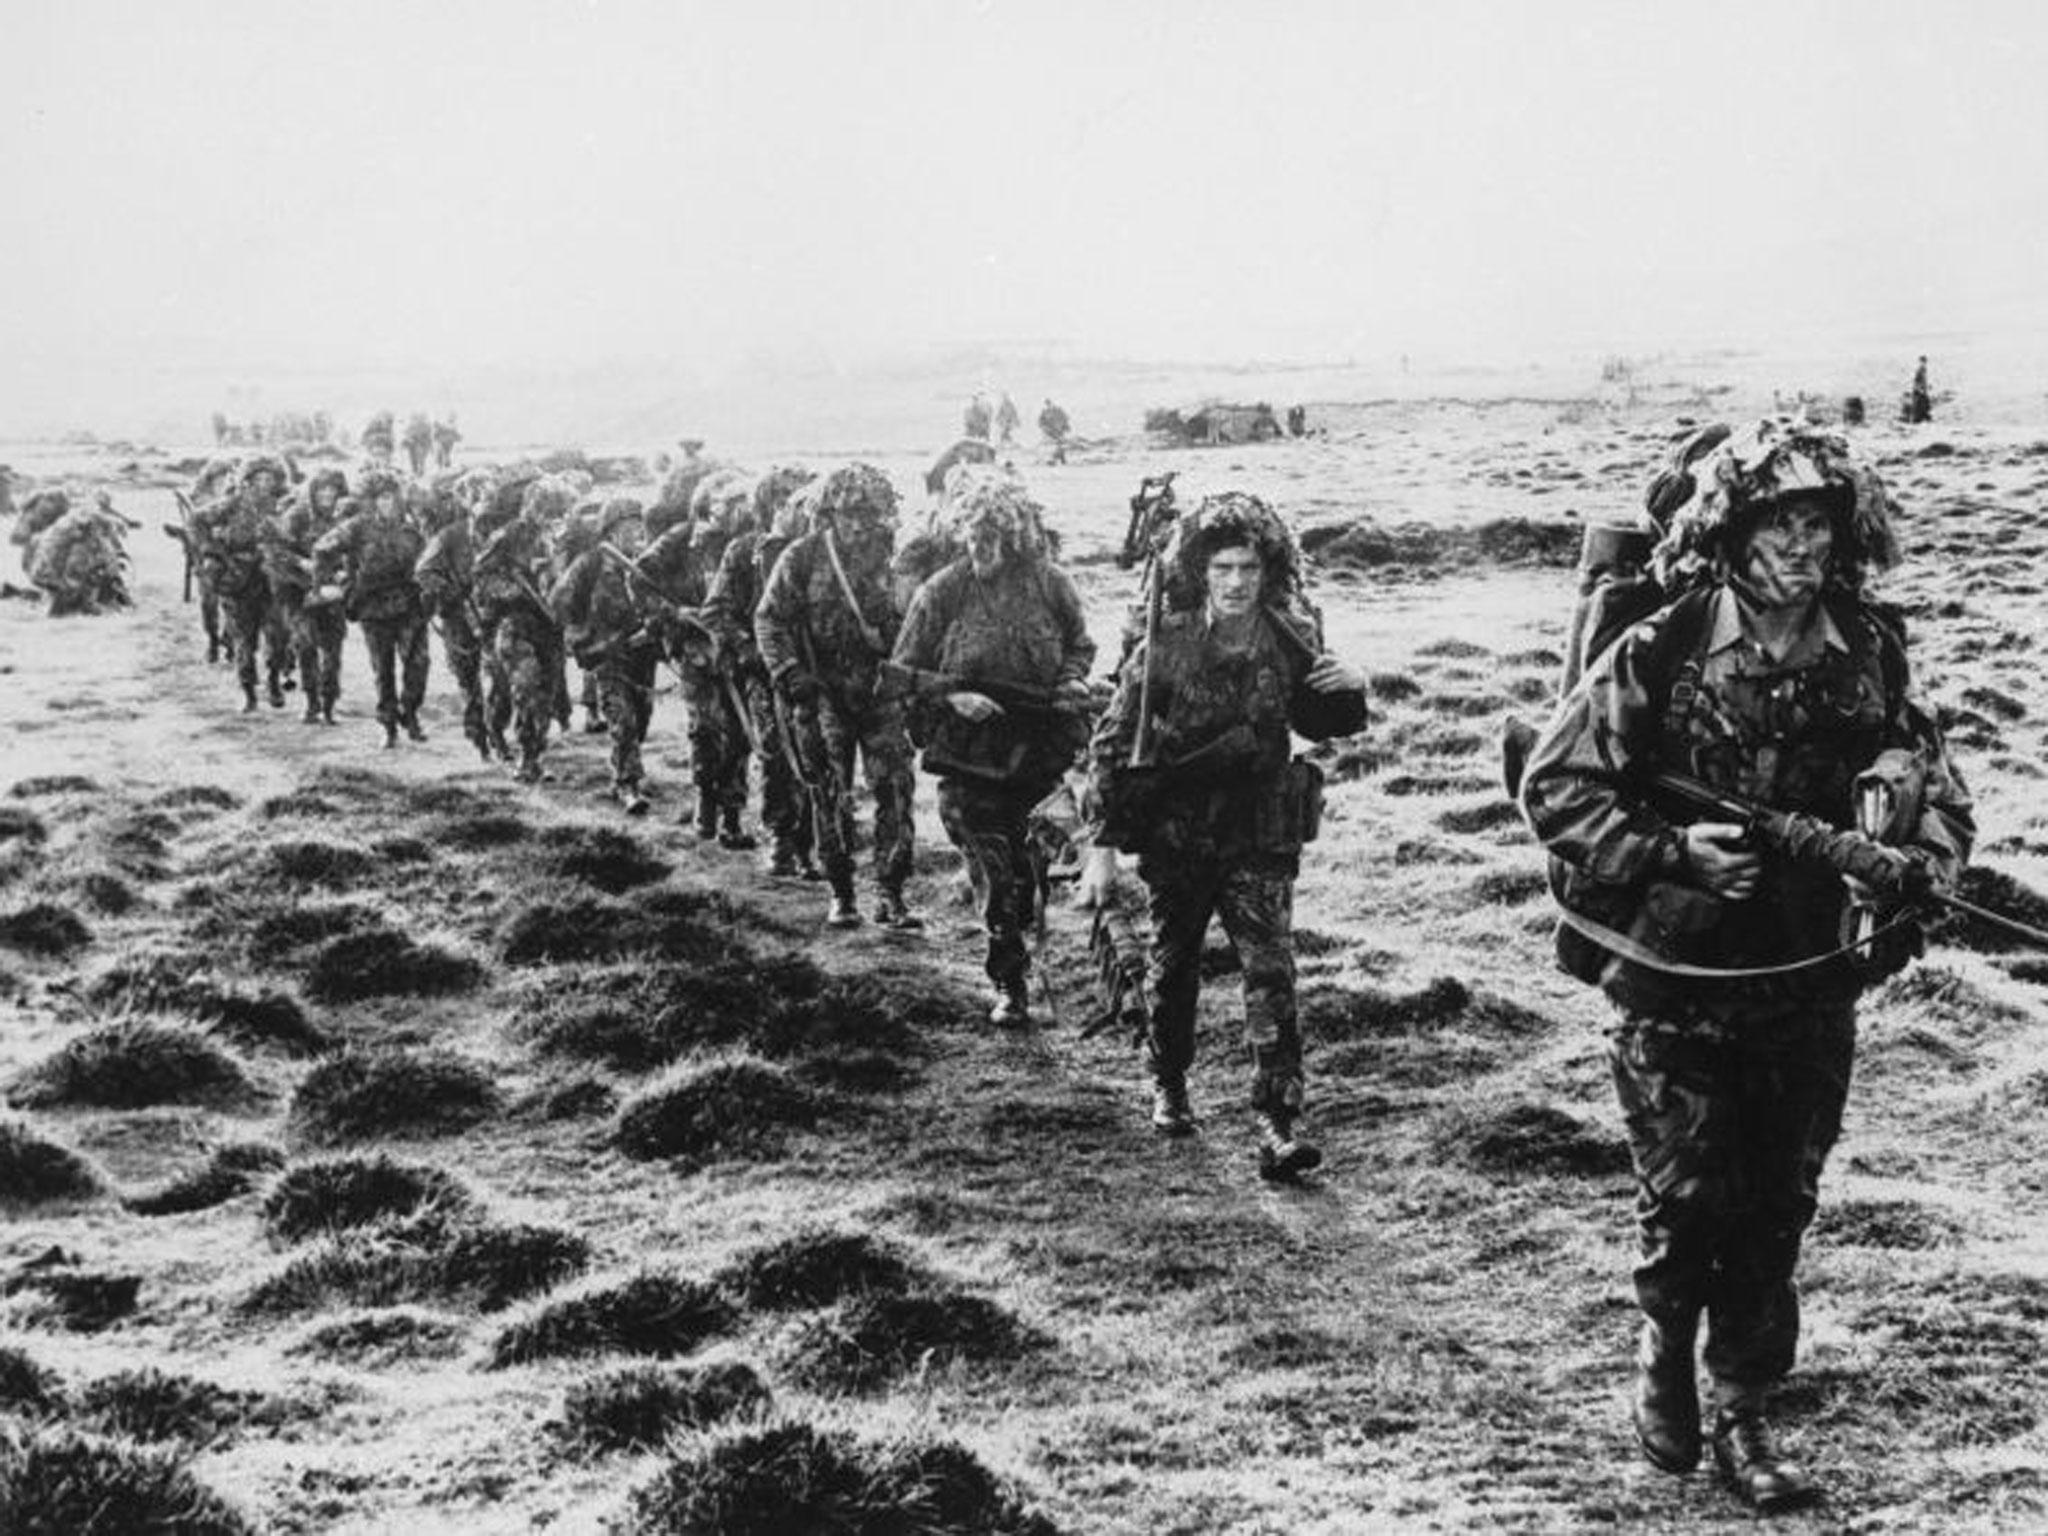 Hồ sơ cuộc chiến giành quần đảo Falkland / Malvinas 1982